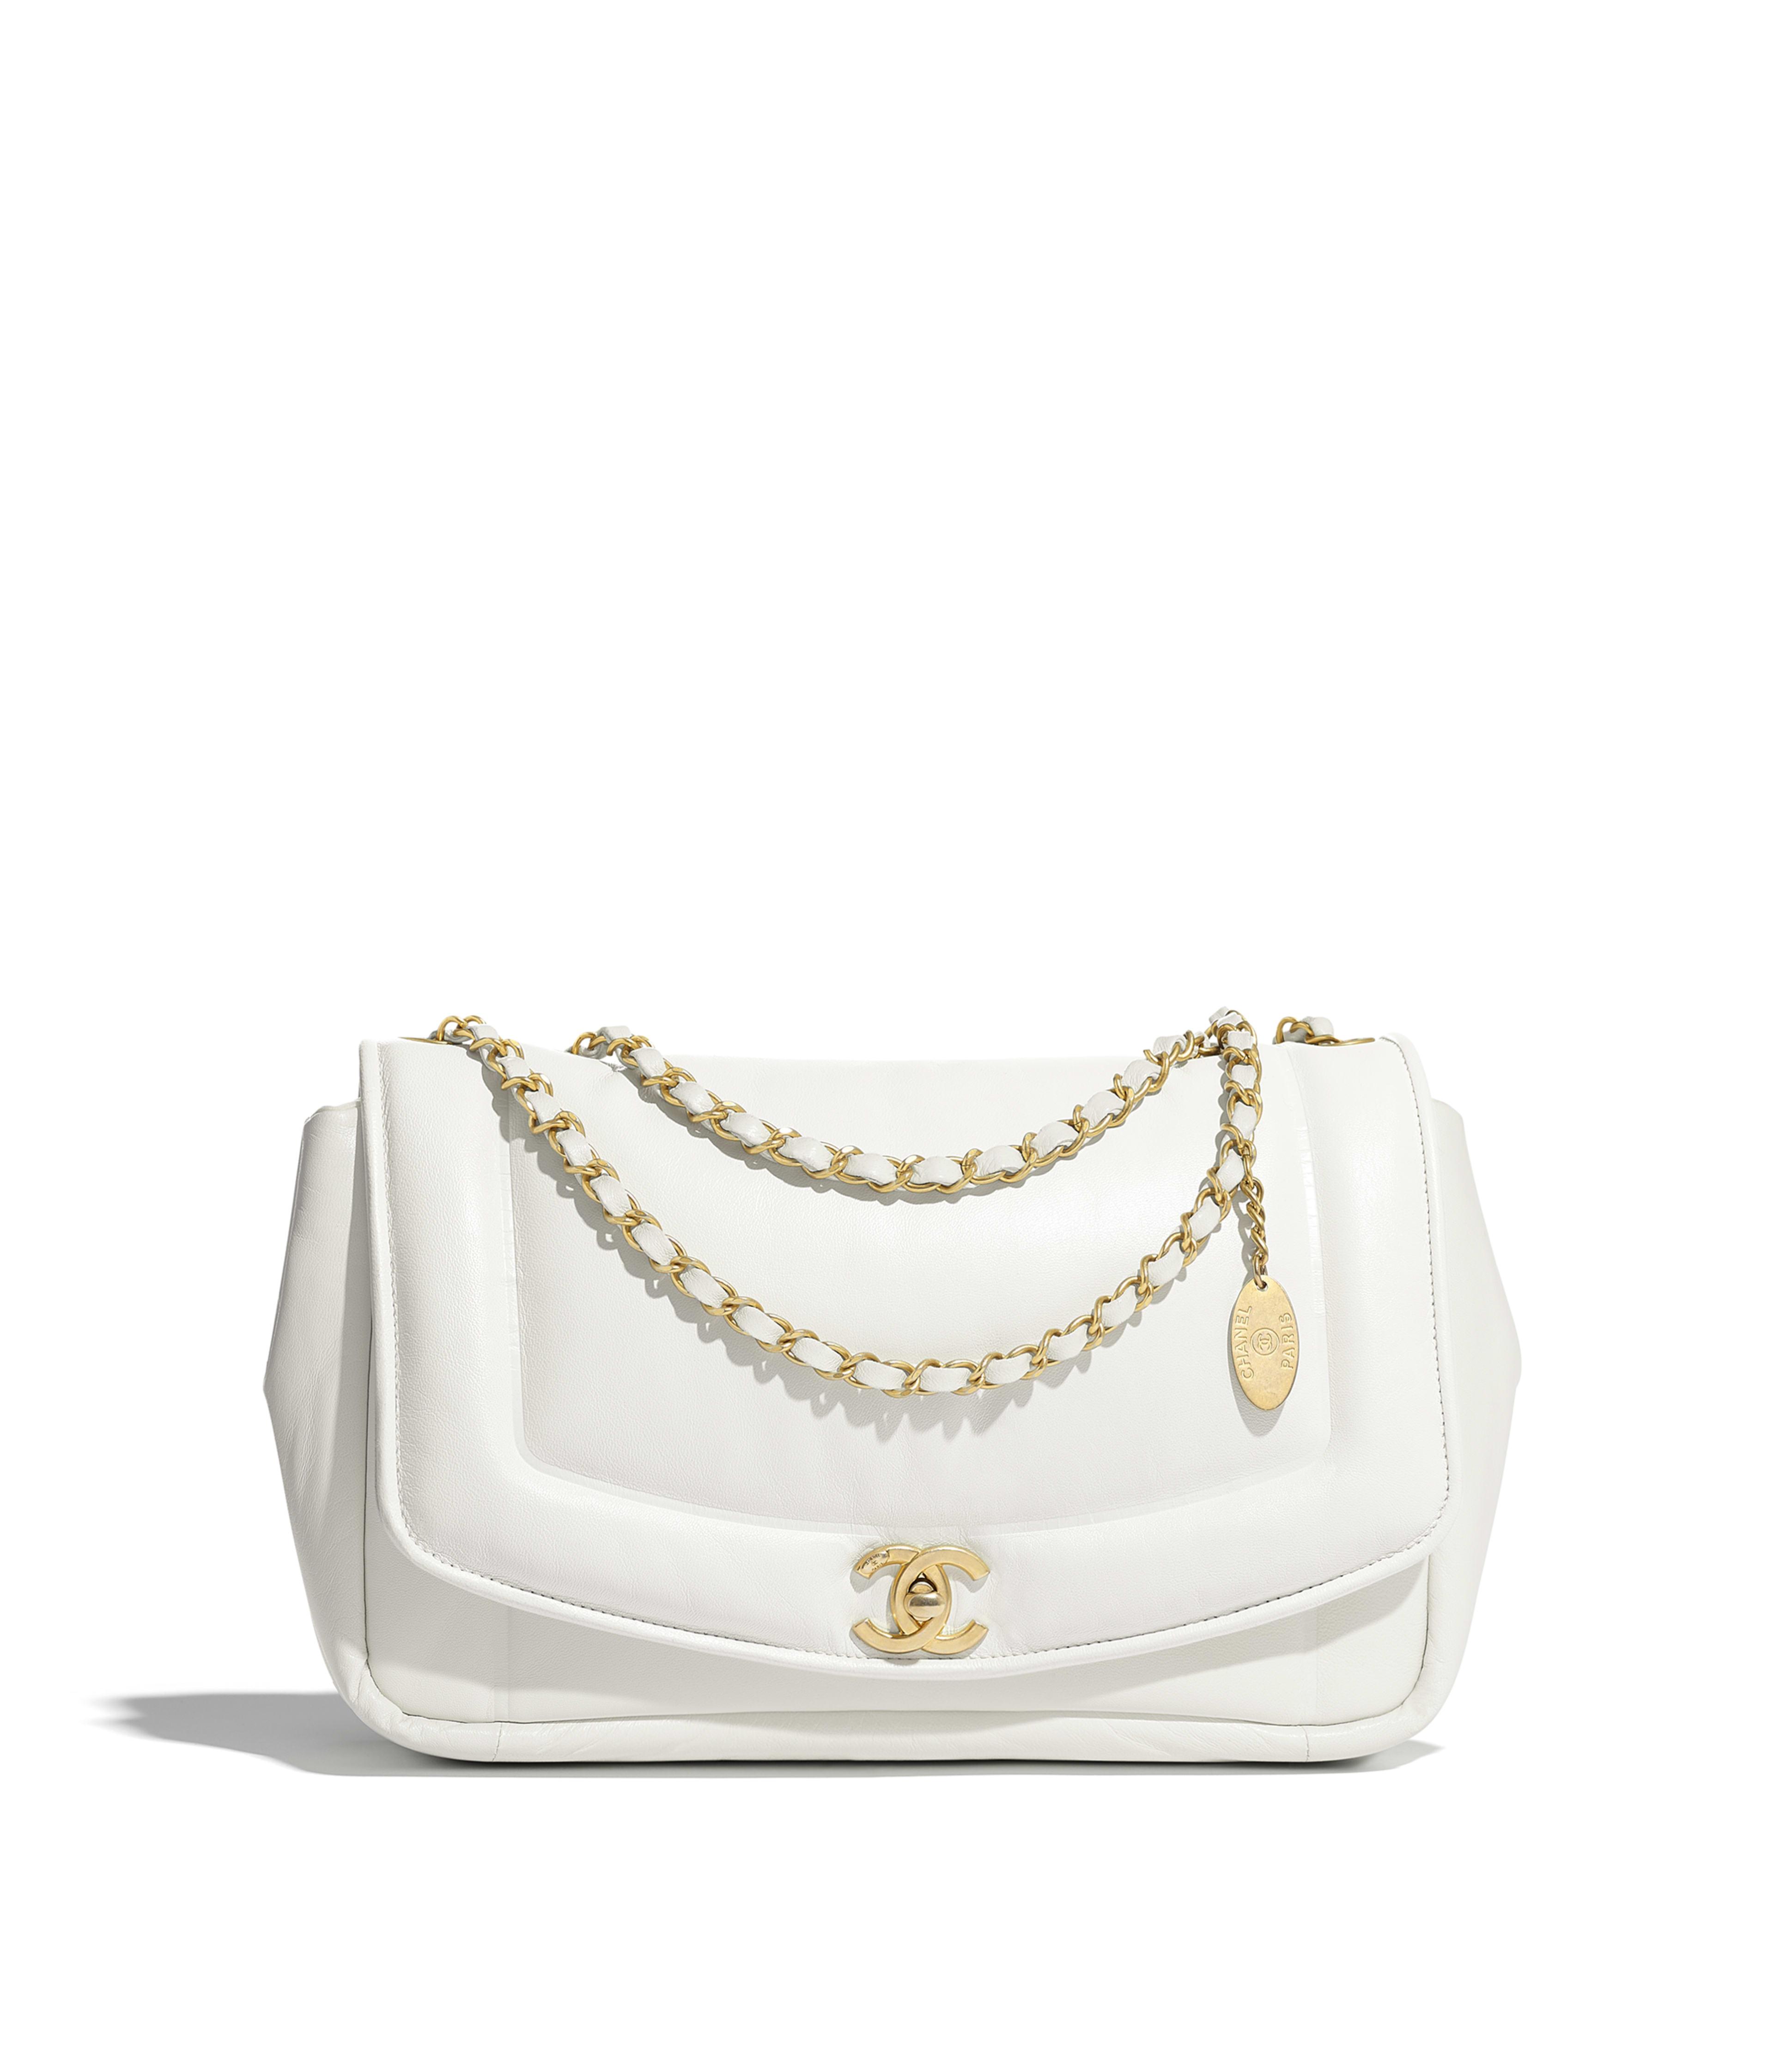 Flap Bags Handbags Chanel Page 2 6